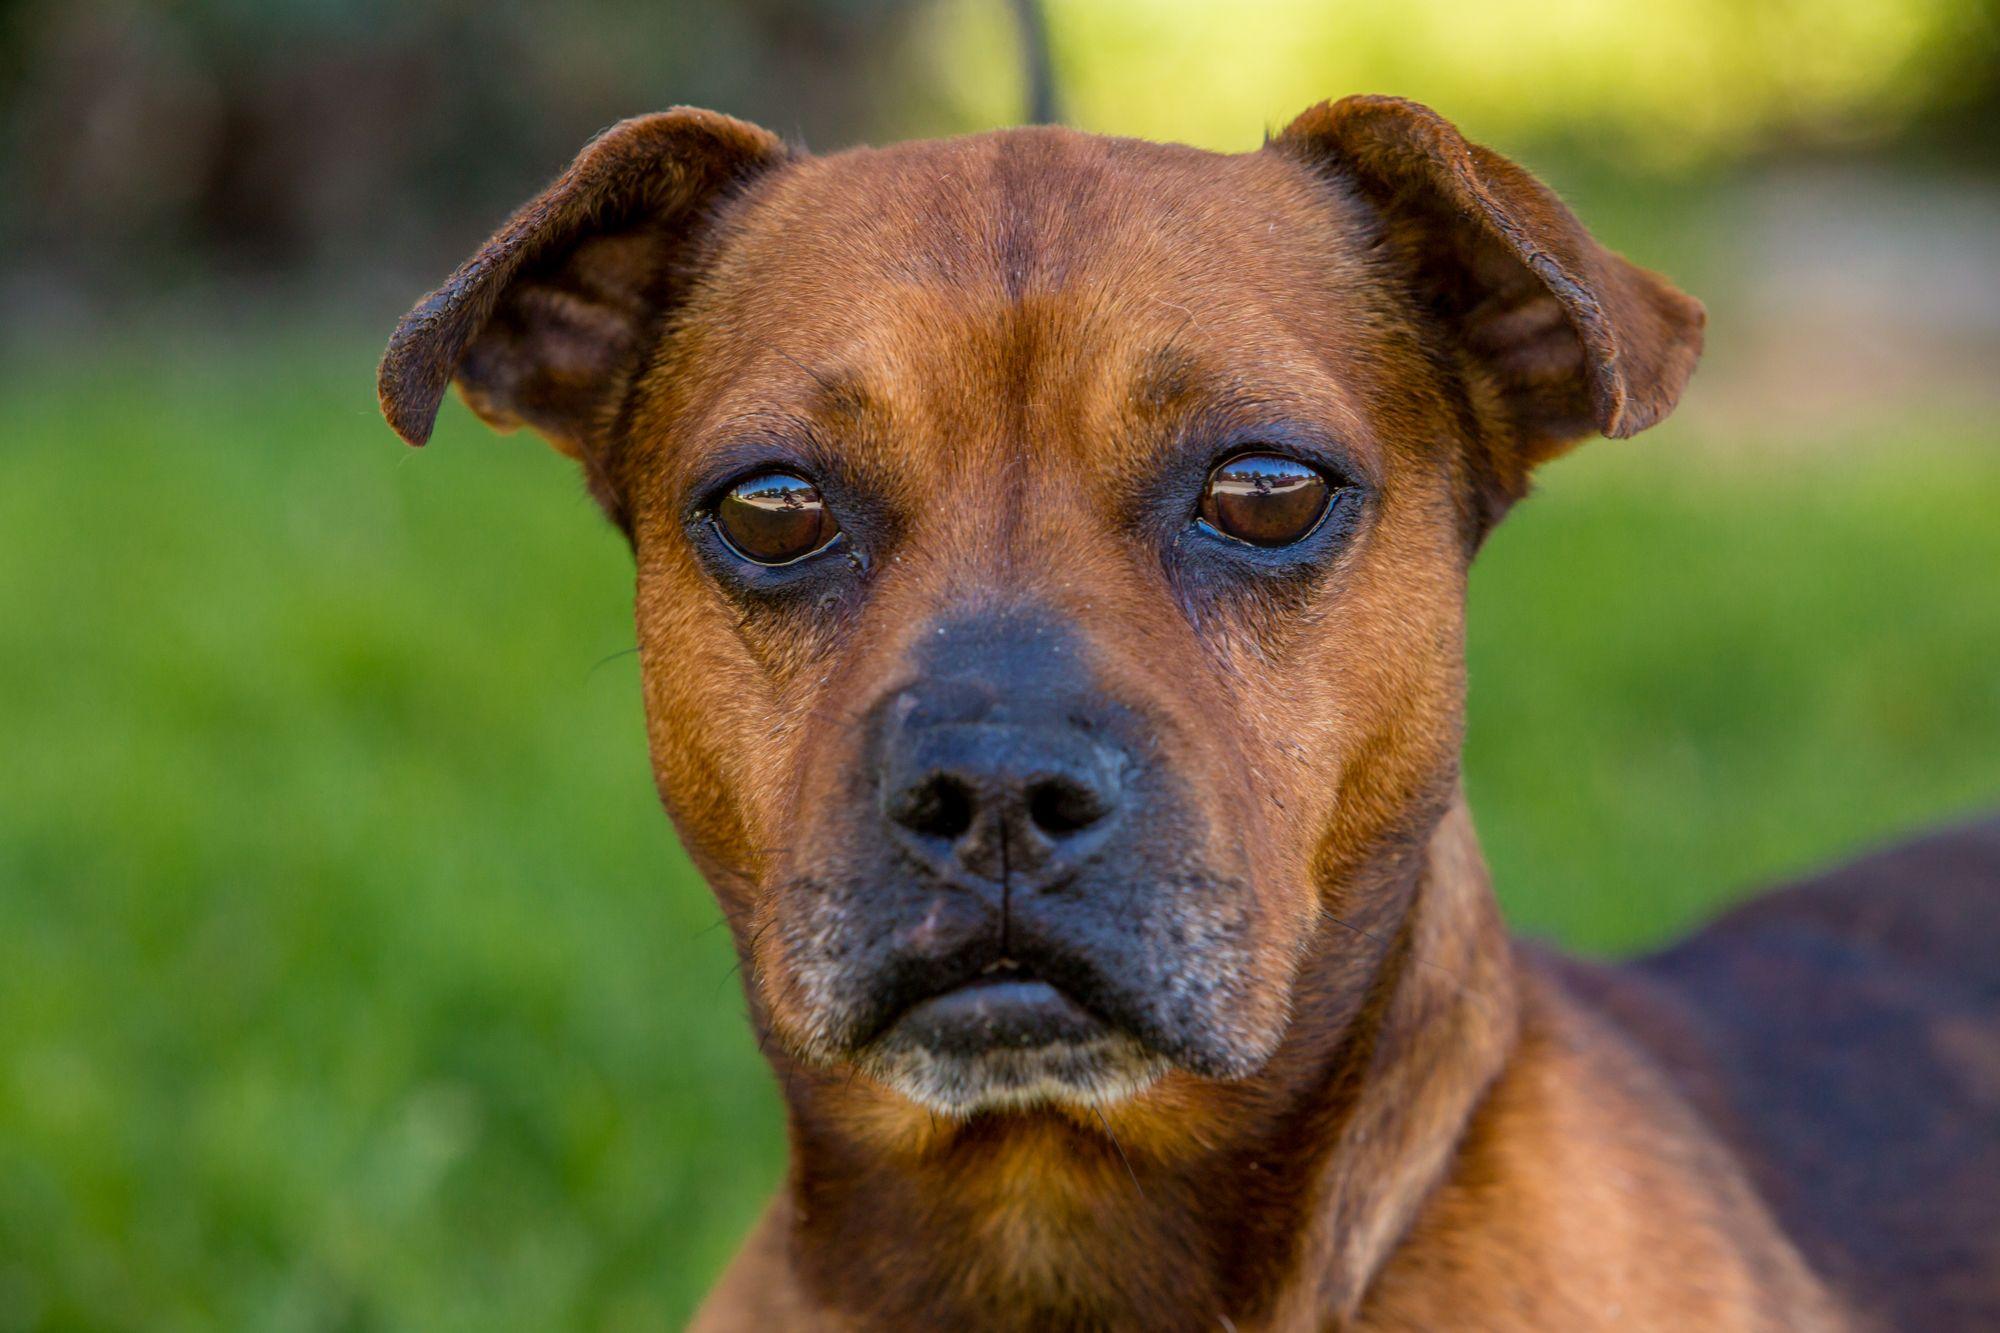 French Bull Weiner dog for Adoption in El Cajon, CA. ADN